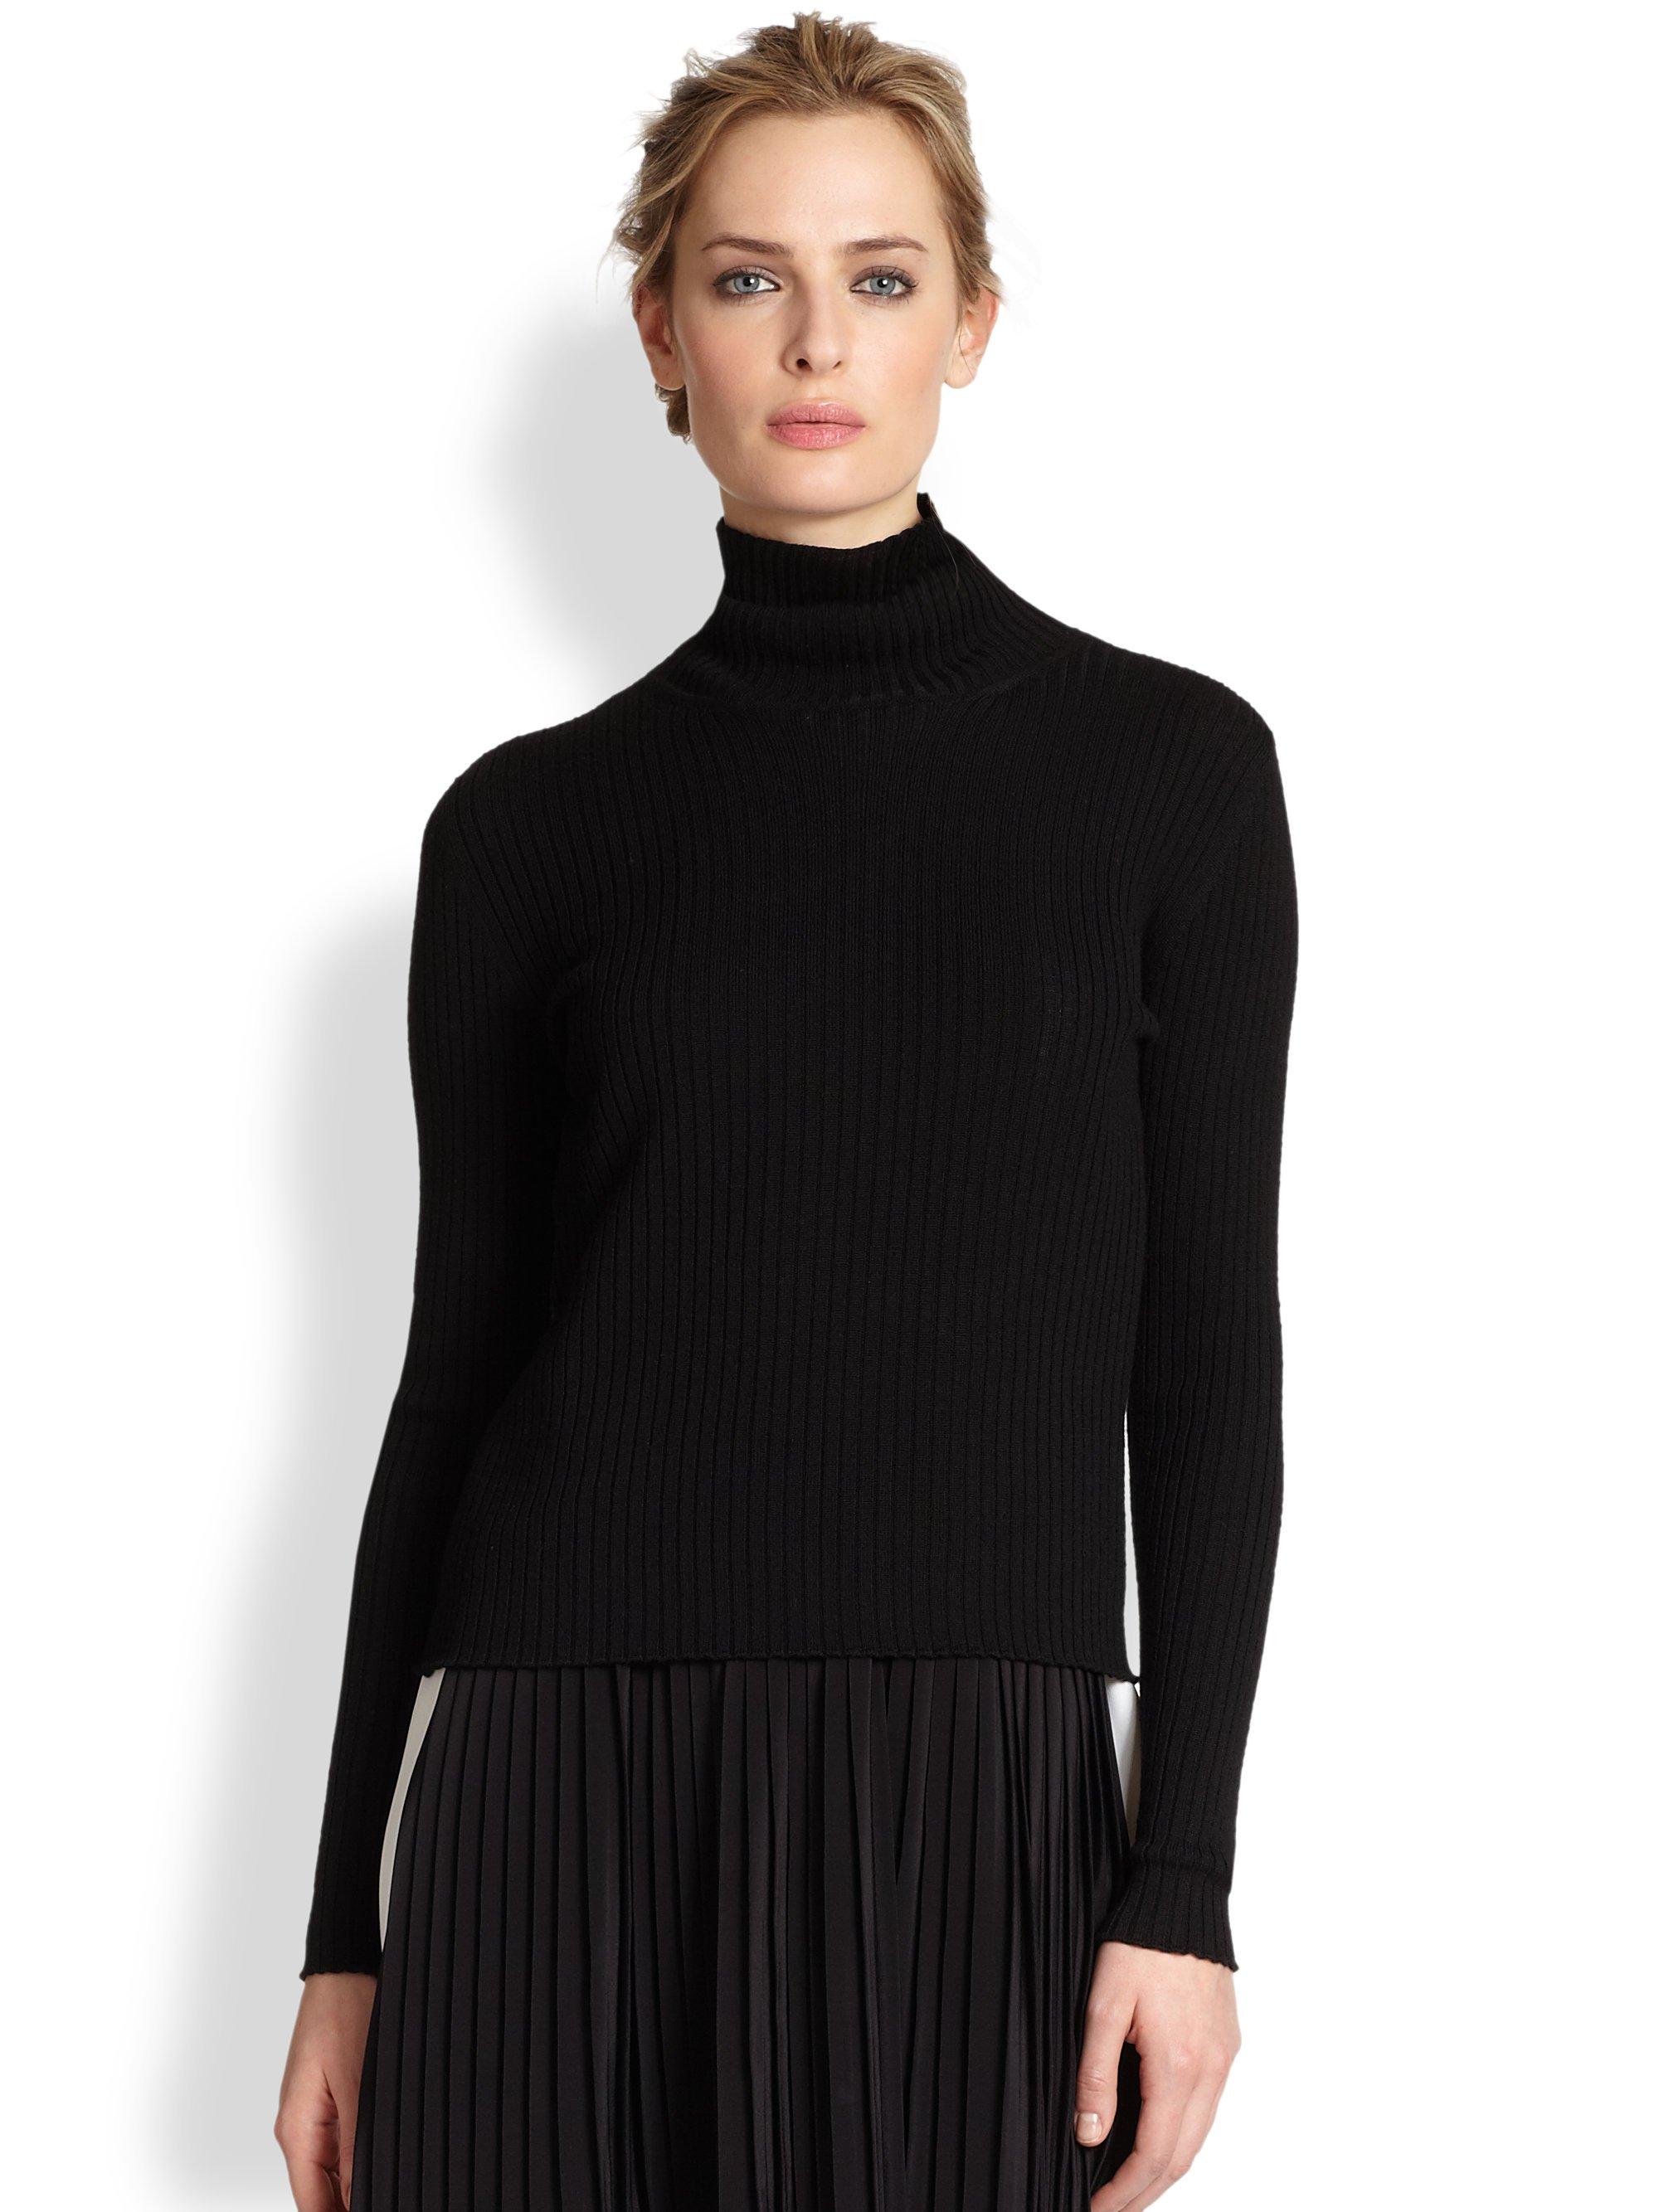 Vanessa bruno Ribbed Merino Wool Turtleneck Sweater in Black | Lyst